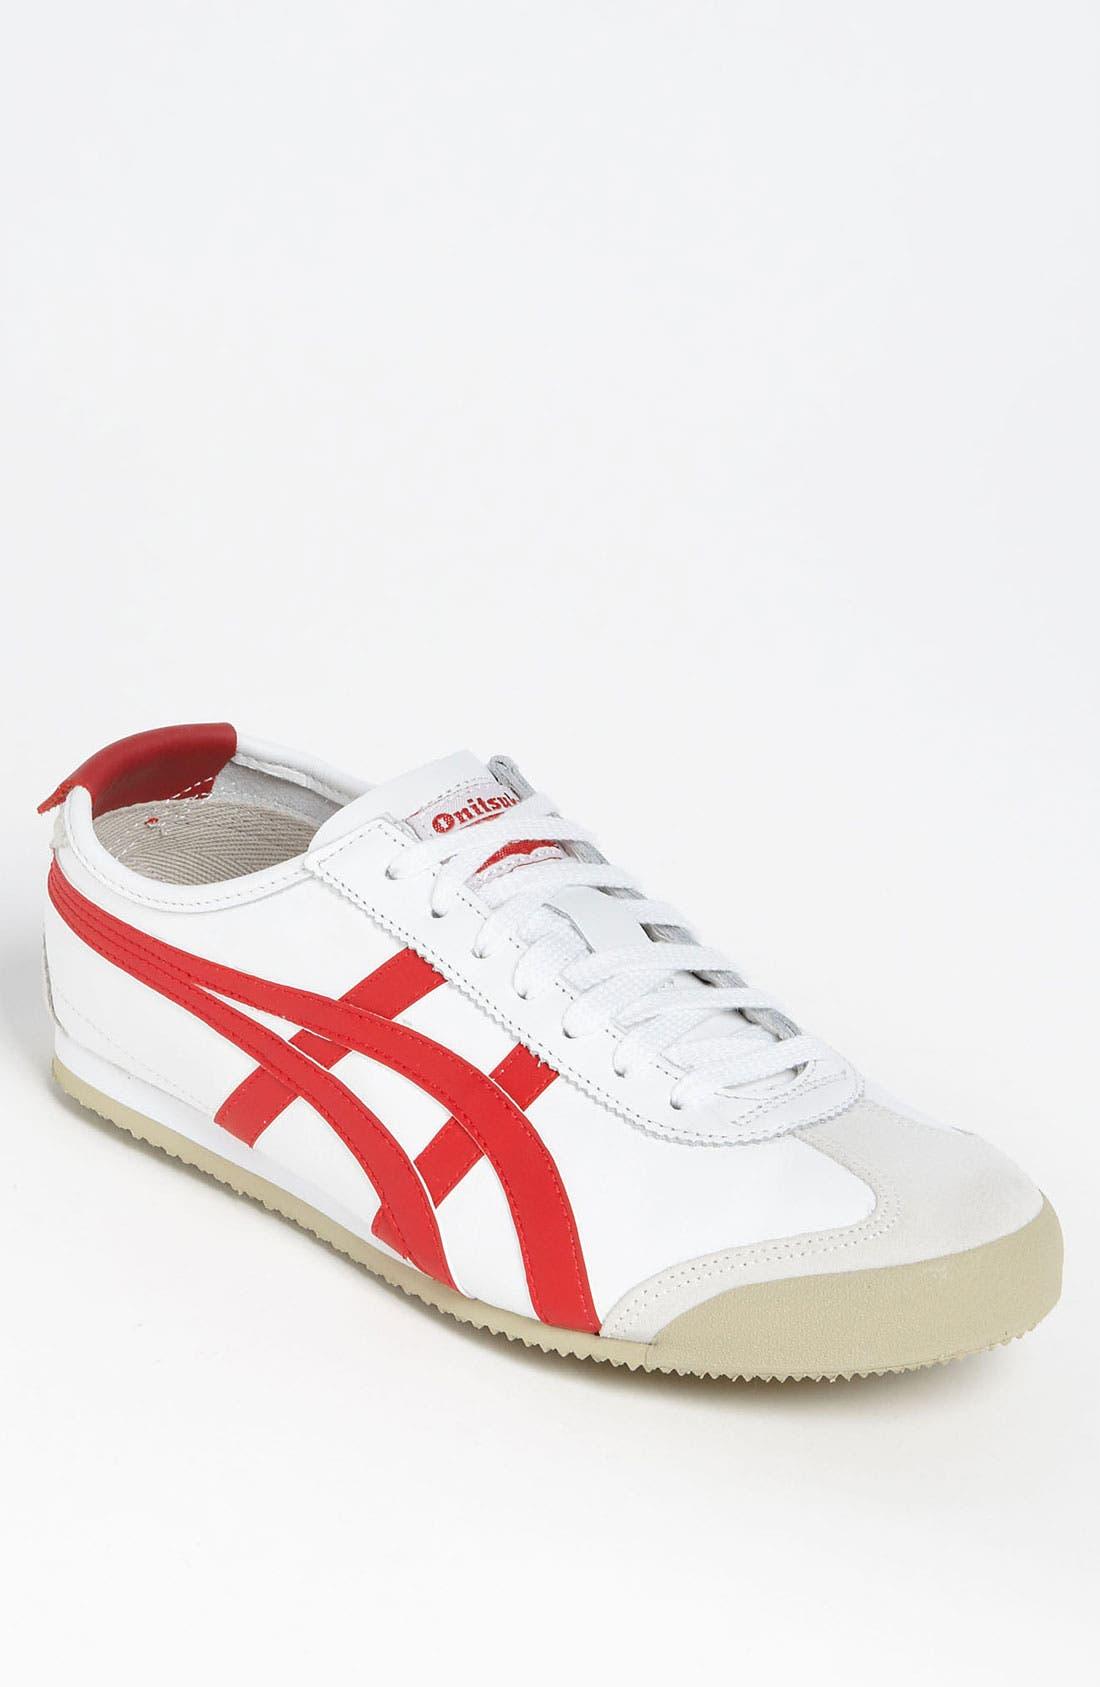 Alternate Image 1 Selected - Onitsuka Tiger™ 'Mexico 66' Sneaker (Men)